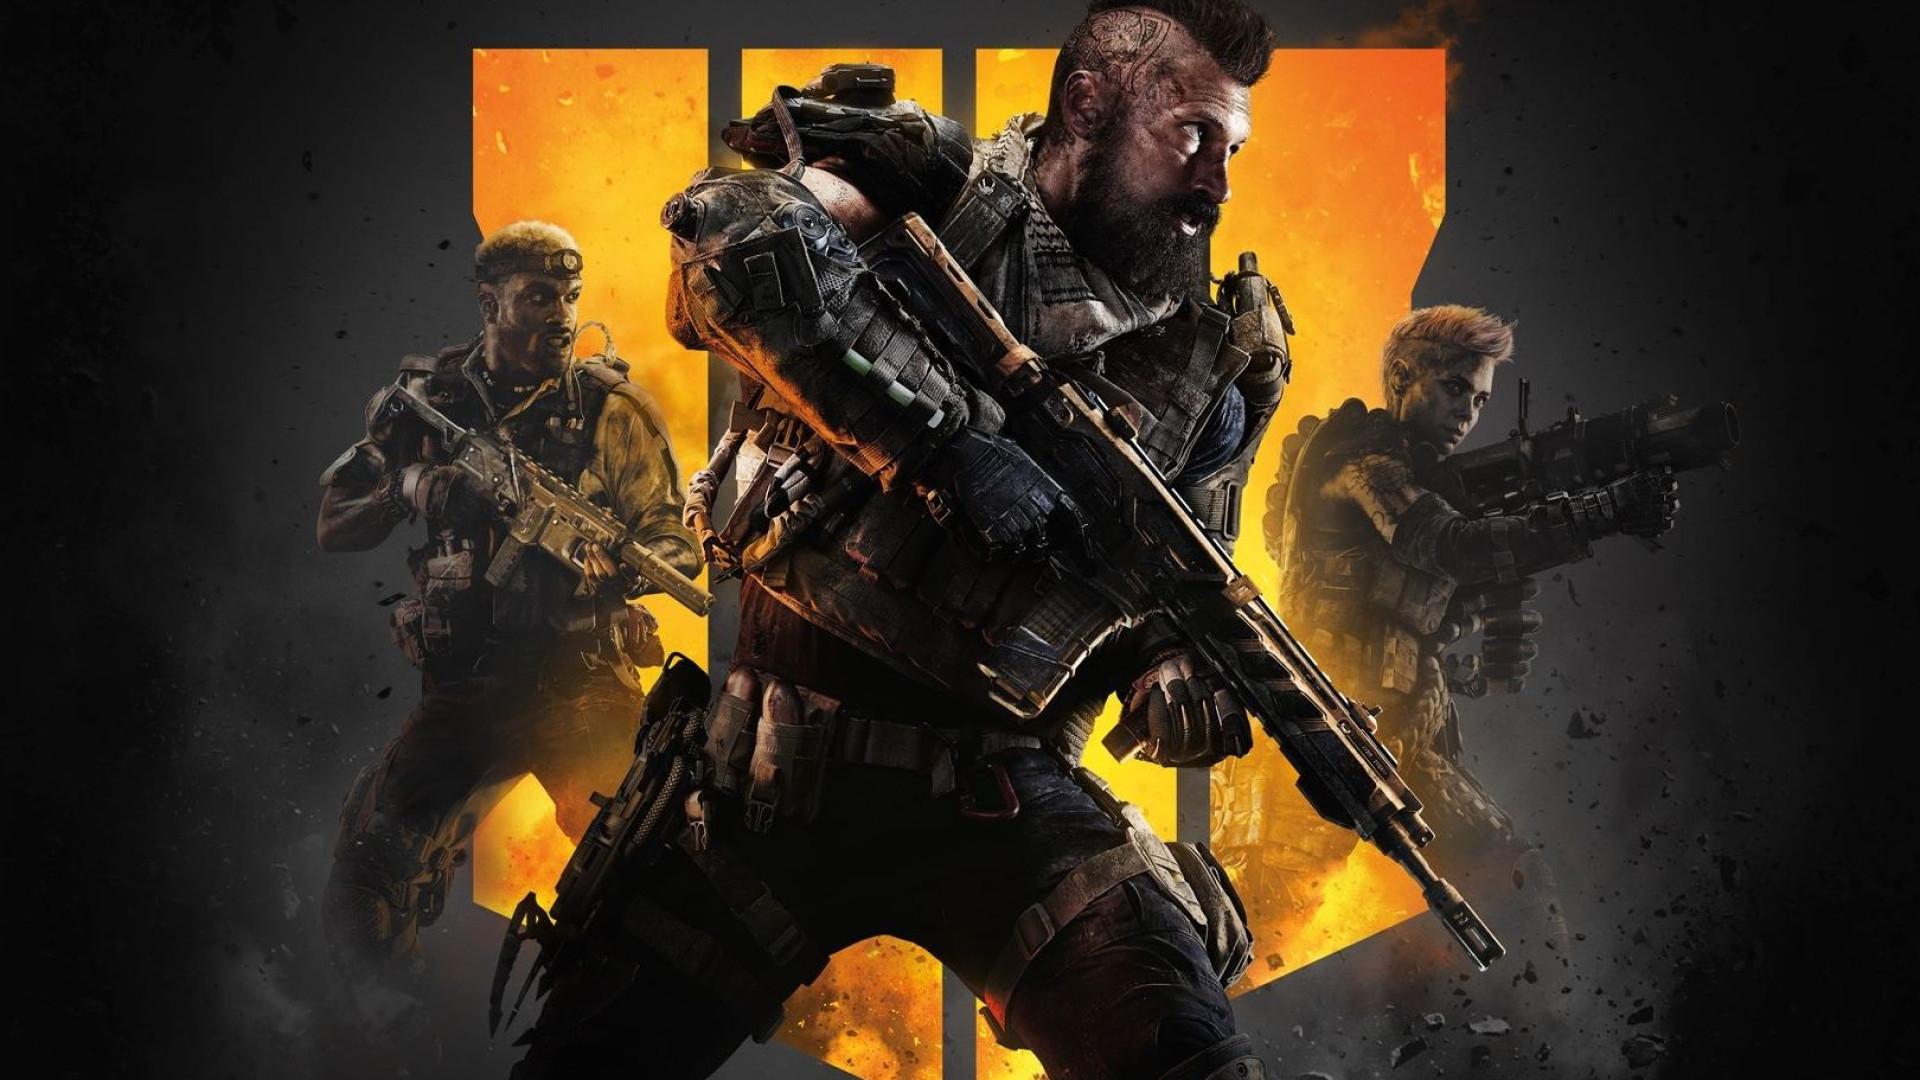 'Call of Duty': Novo trailer mostra esperado modo 'battle royale'